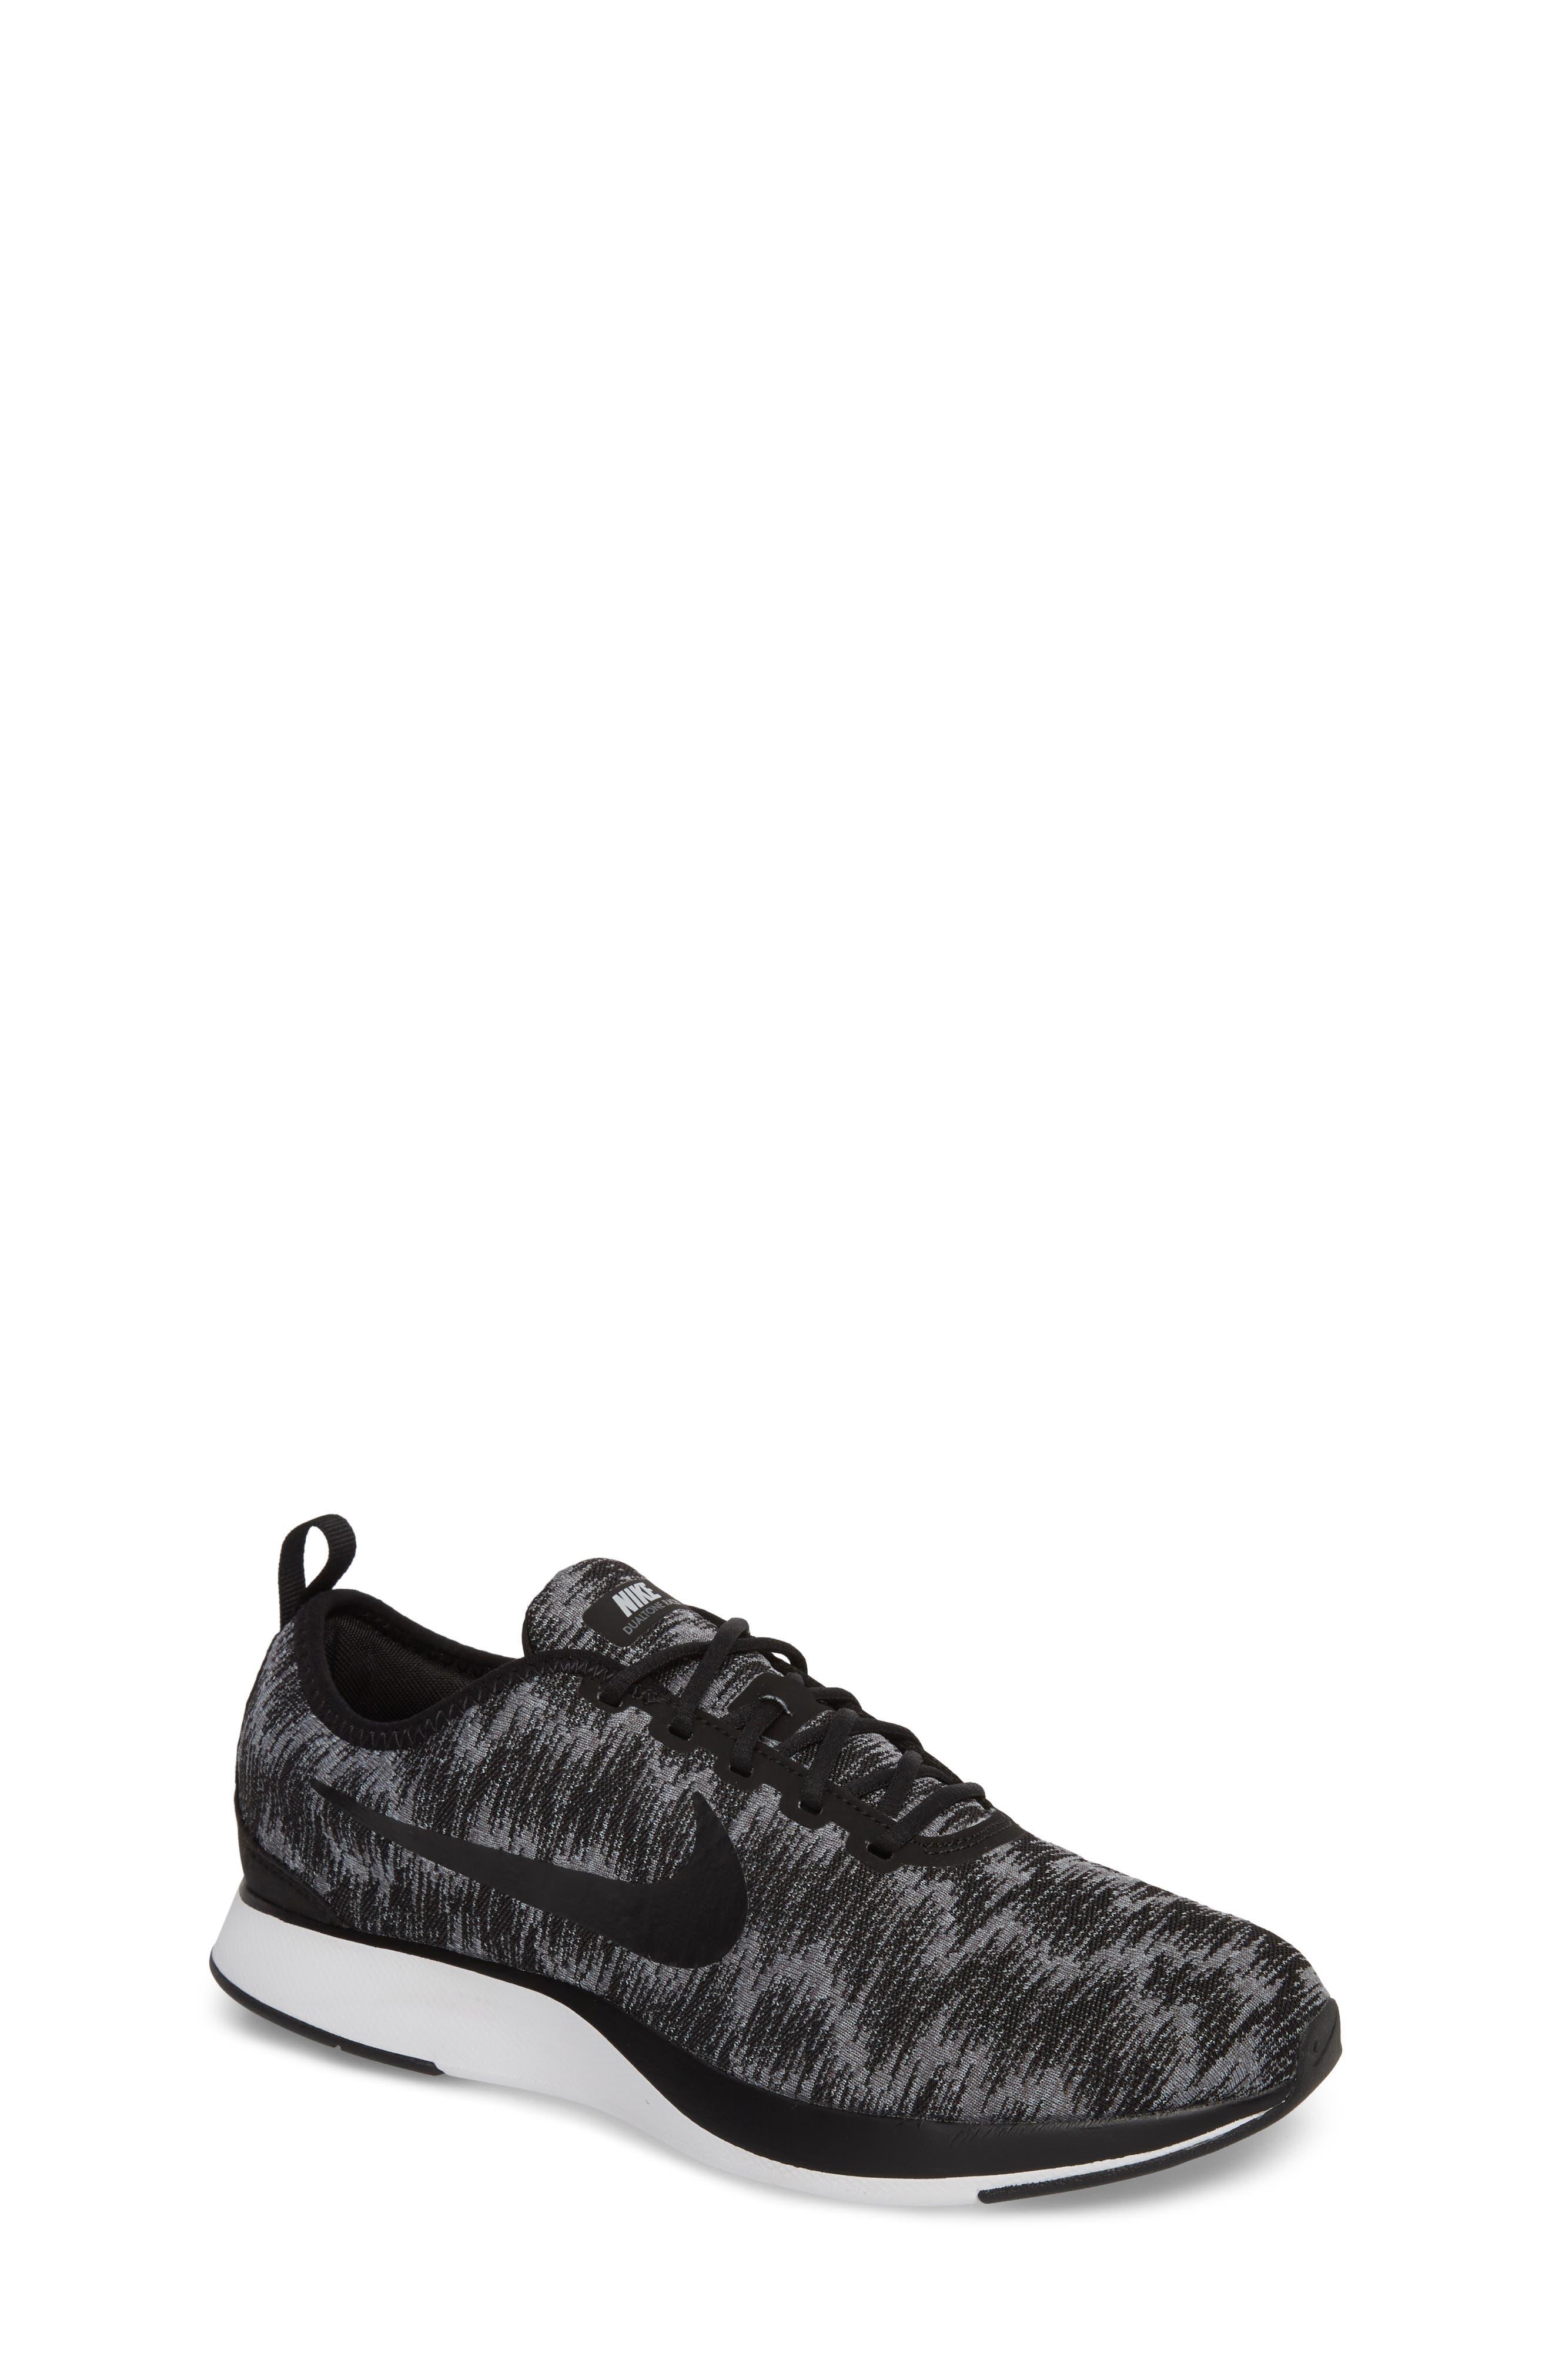 Dualtone Racer SE Sneaker,                         Main,                         color, 004